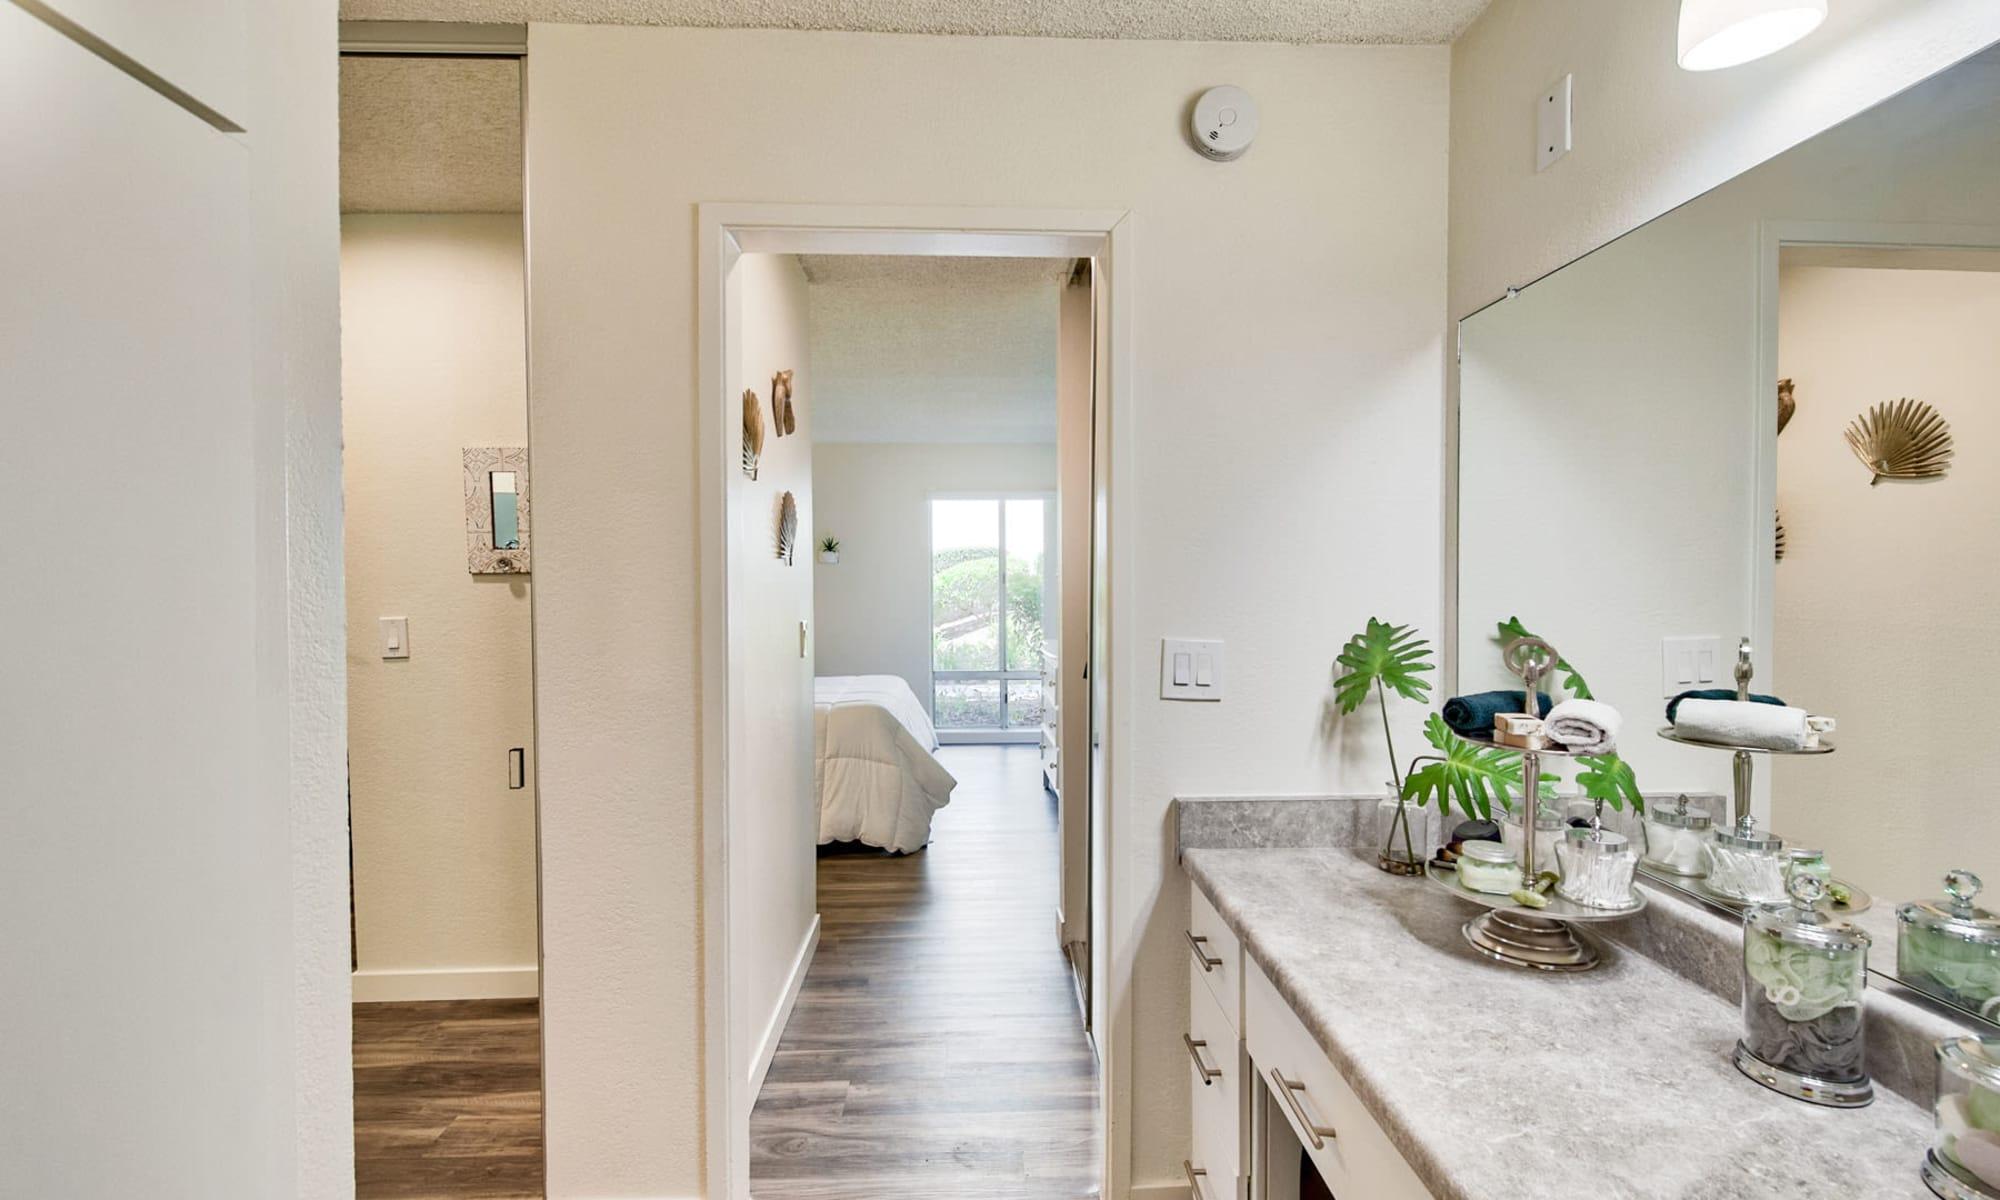 En suite bathroom with granite countertops in a model home's primary bedroom at Mediterranean Village Apartments in Costa Mesa, California